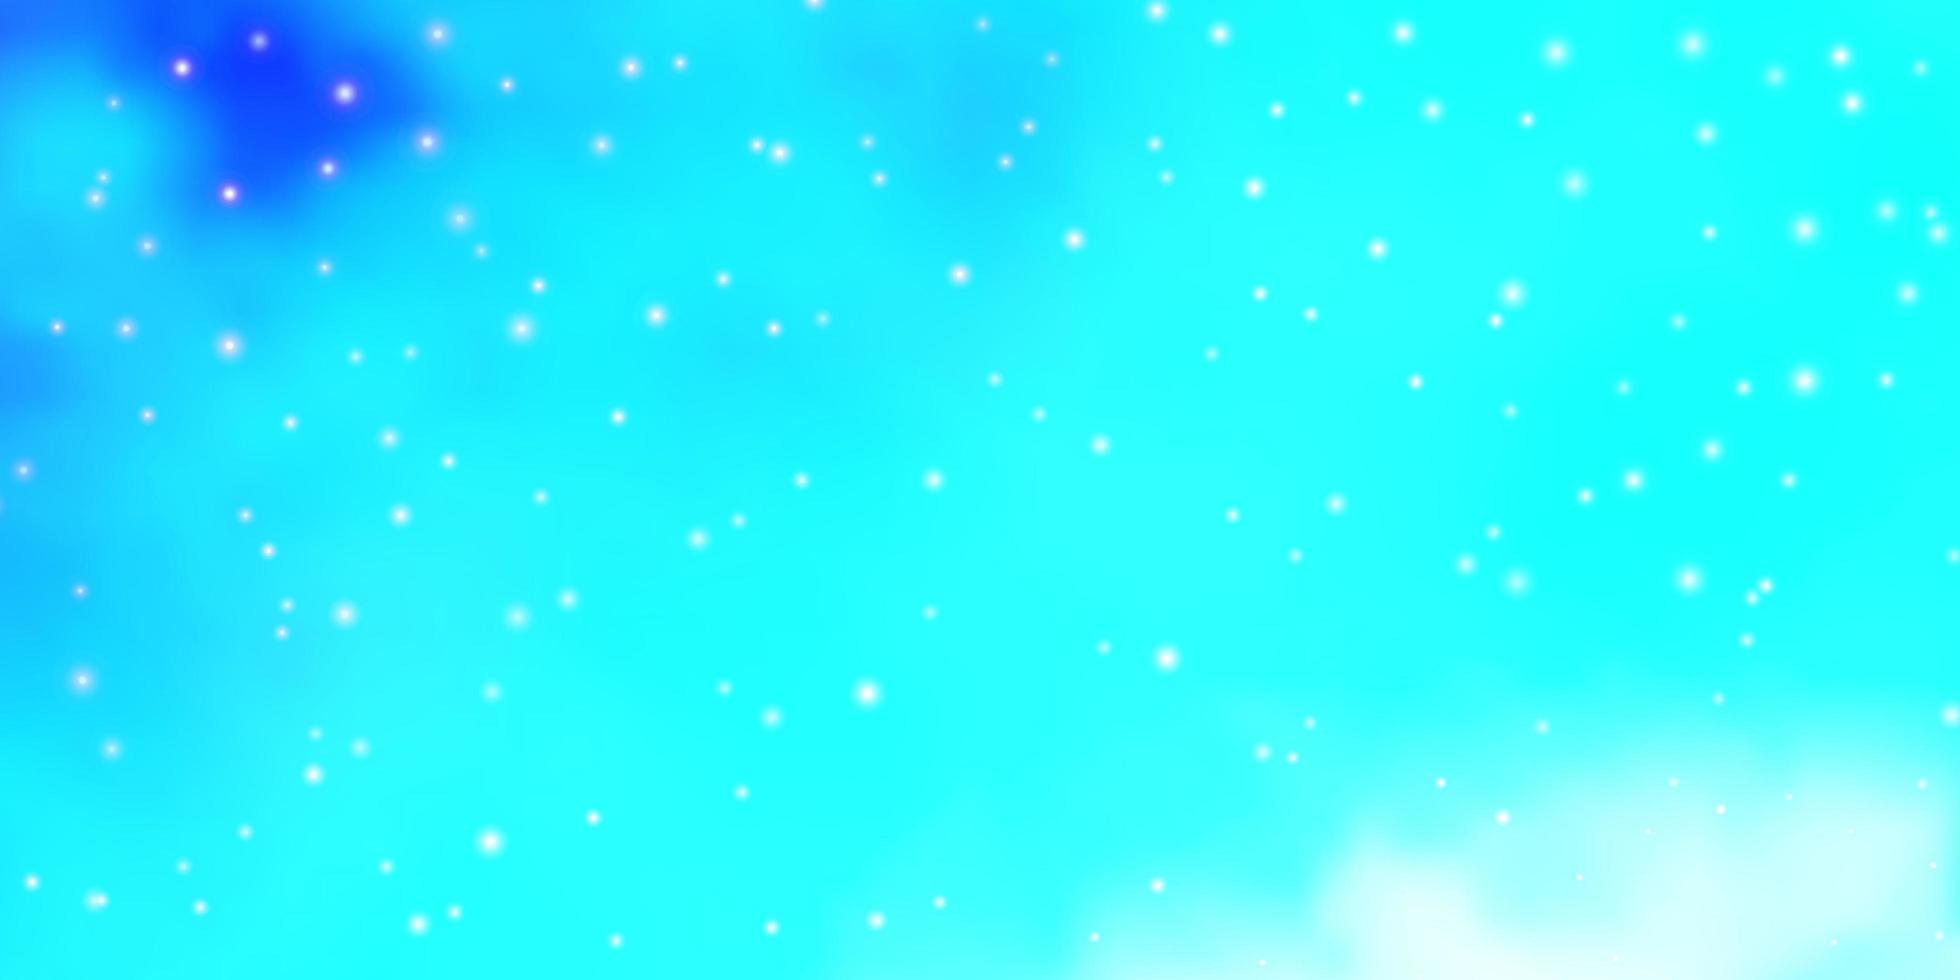 textura vector azul e verde claro com belas estrelas.